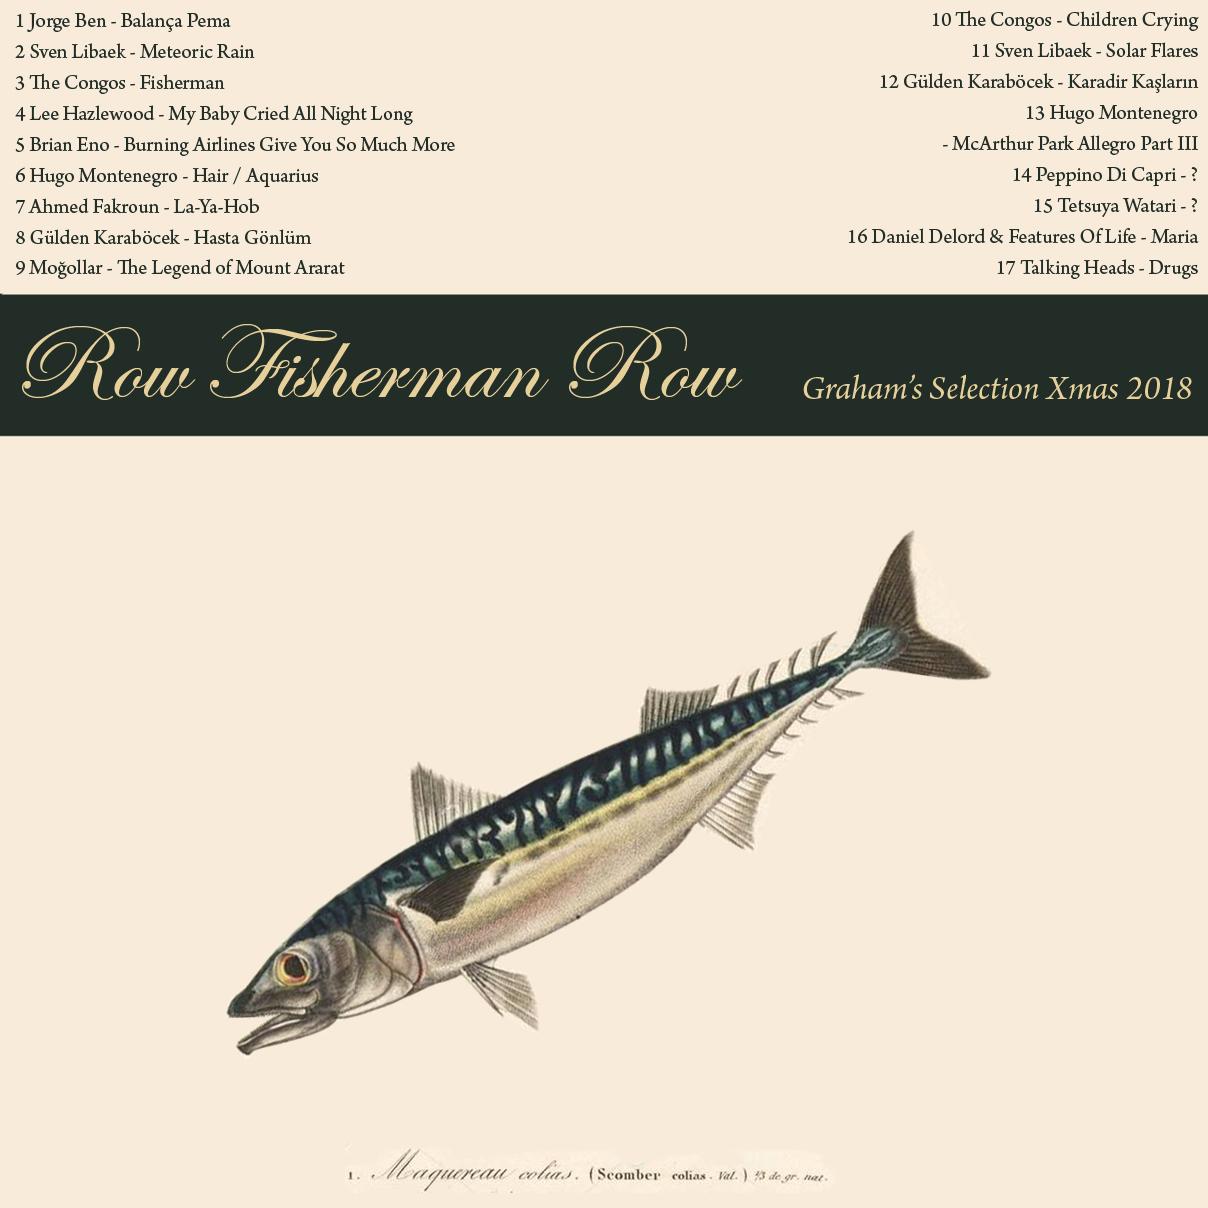 GRHM#14 - ROW FISHERMAN ROW